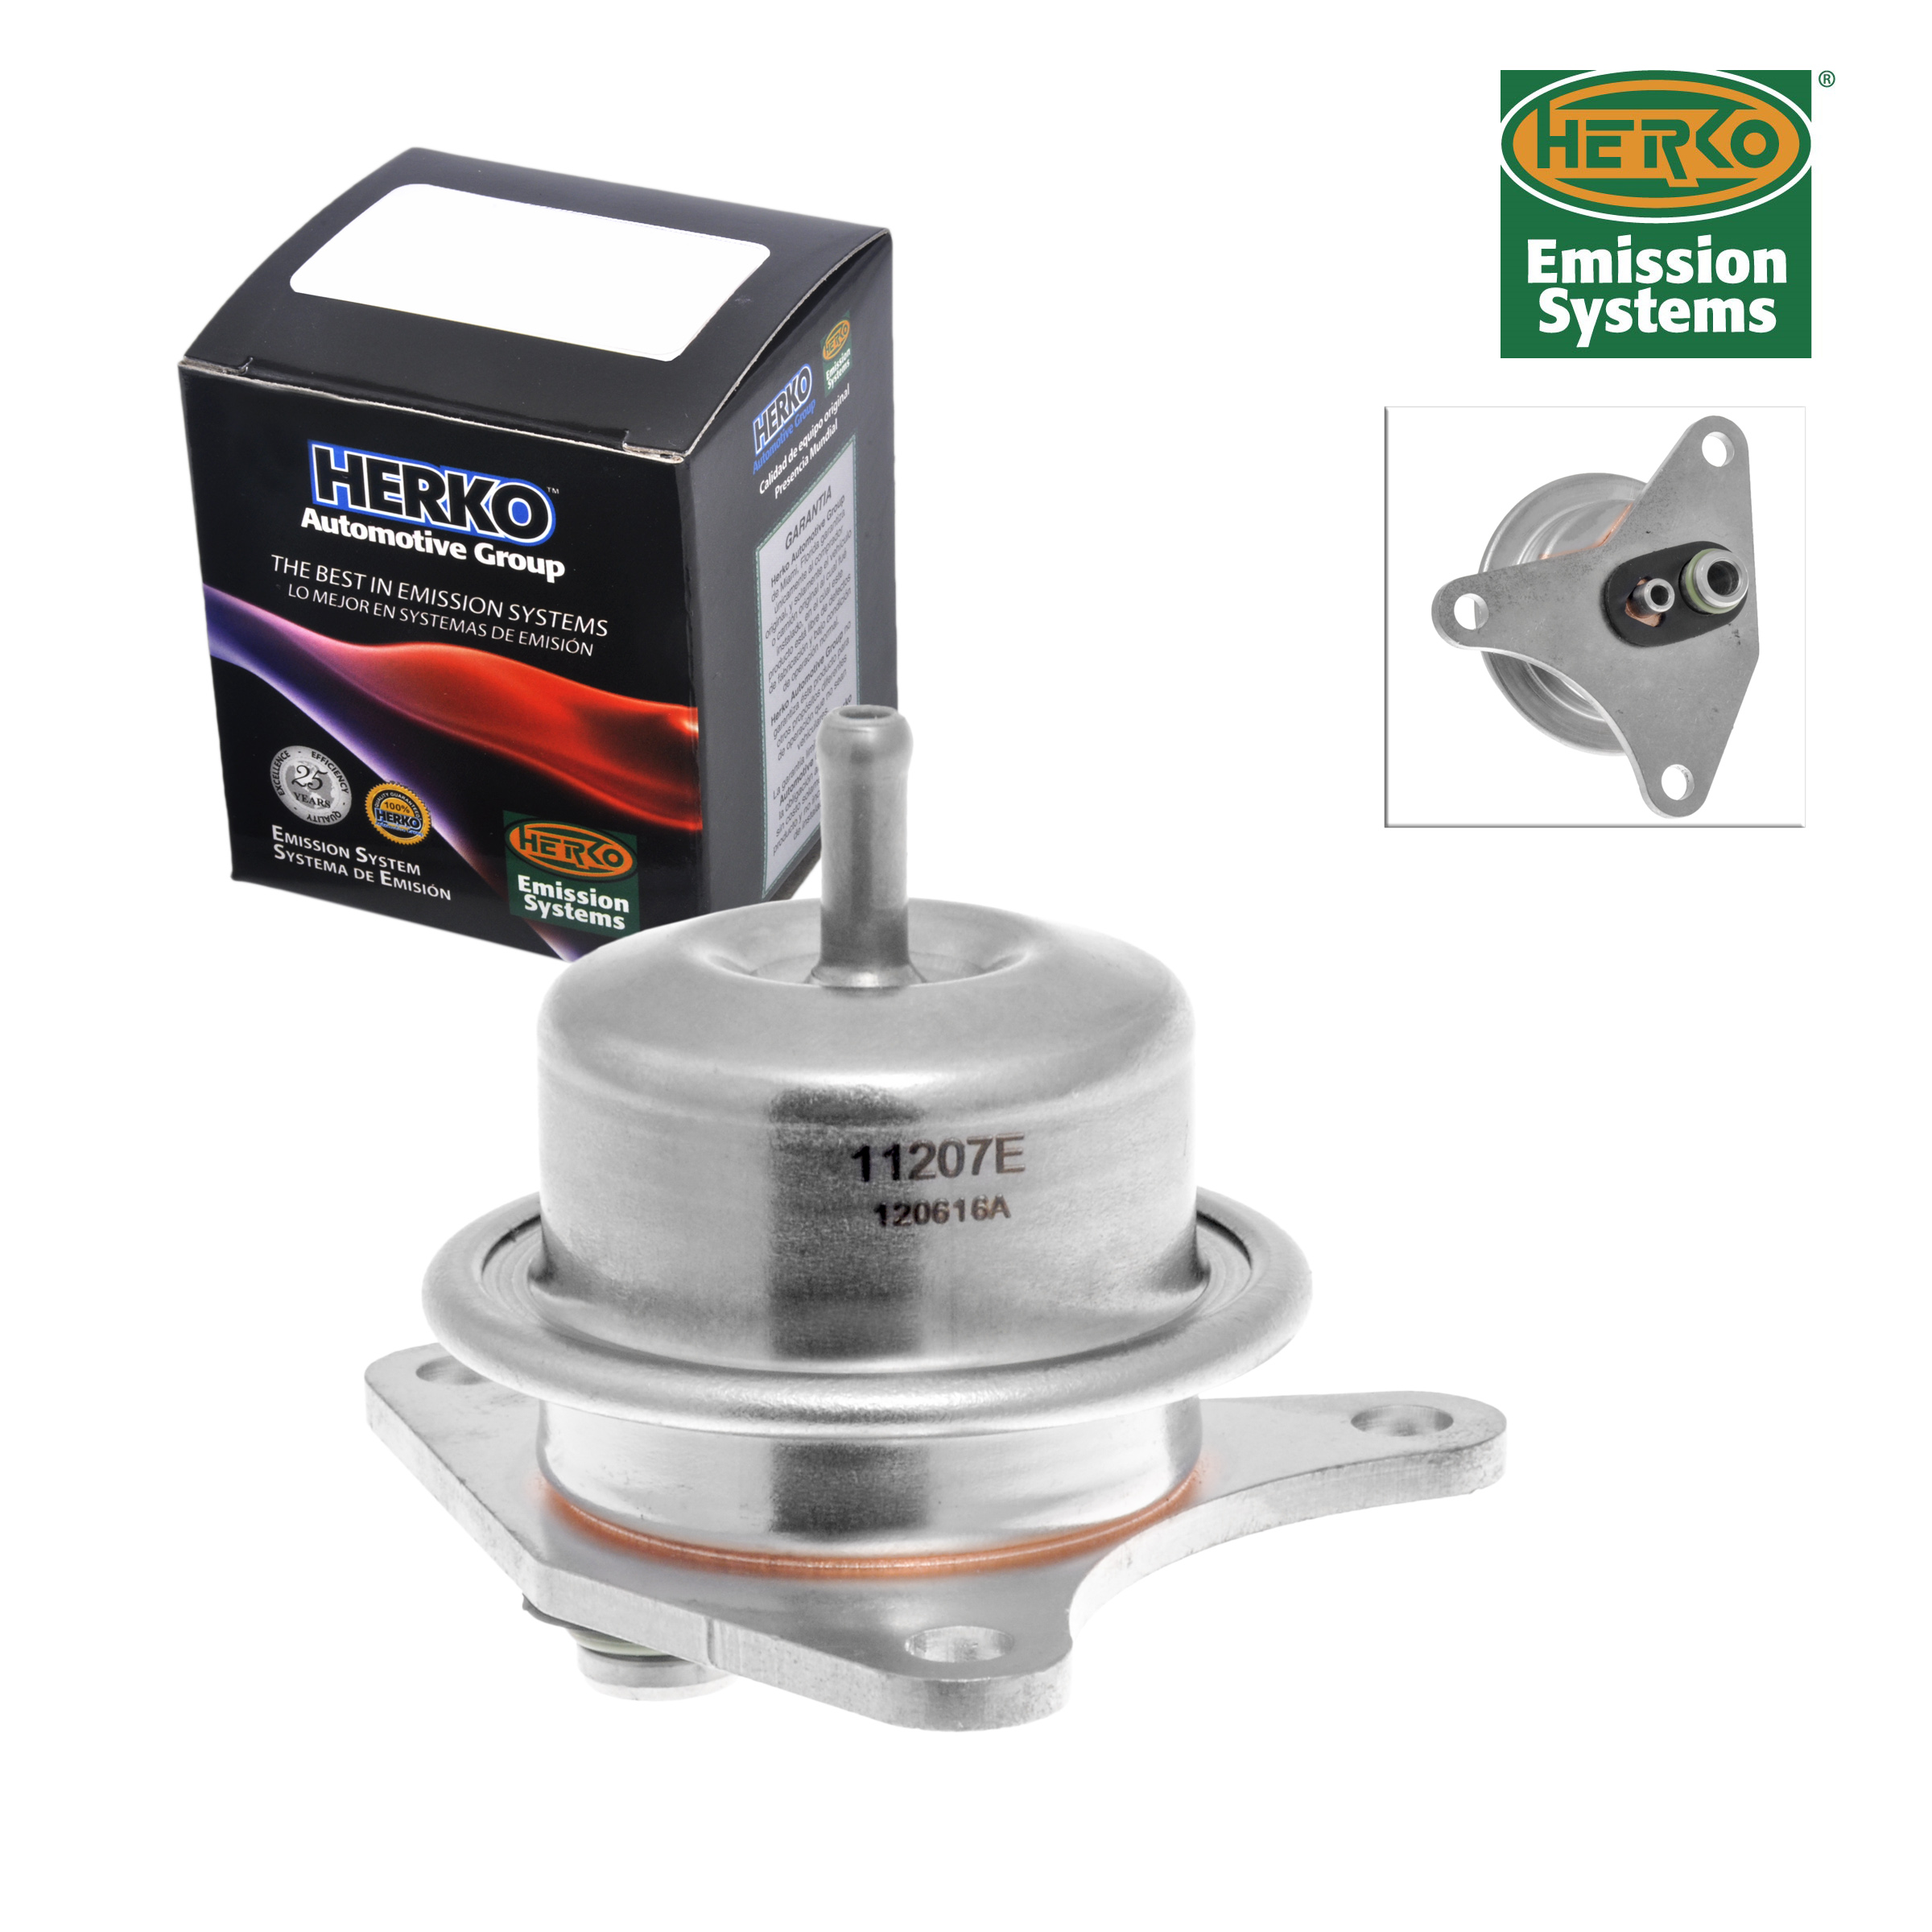 New Fuel Injection Pressure Regulator Fit Dodge Neon Chrysler  Sebring Plymouth